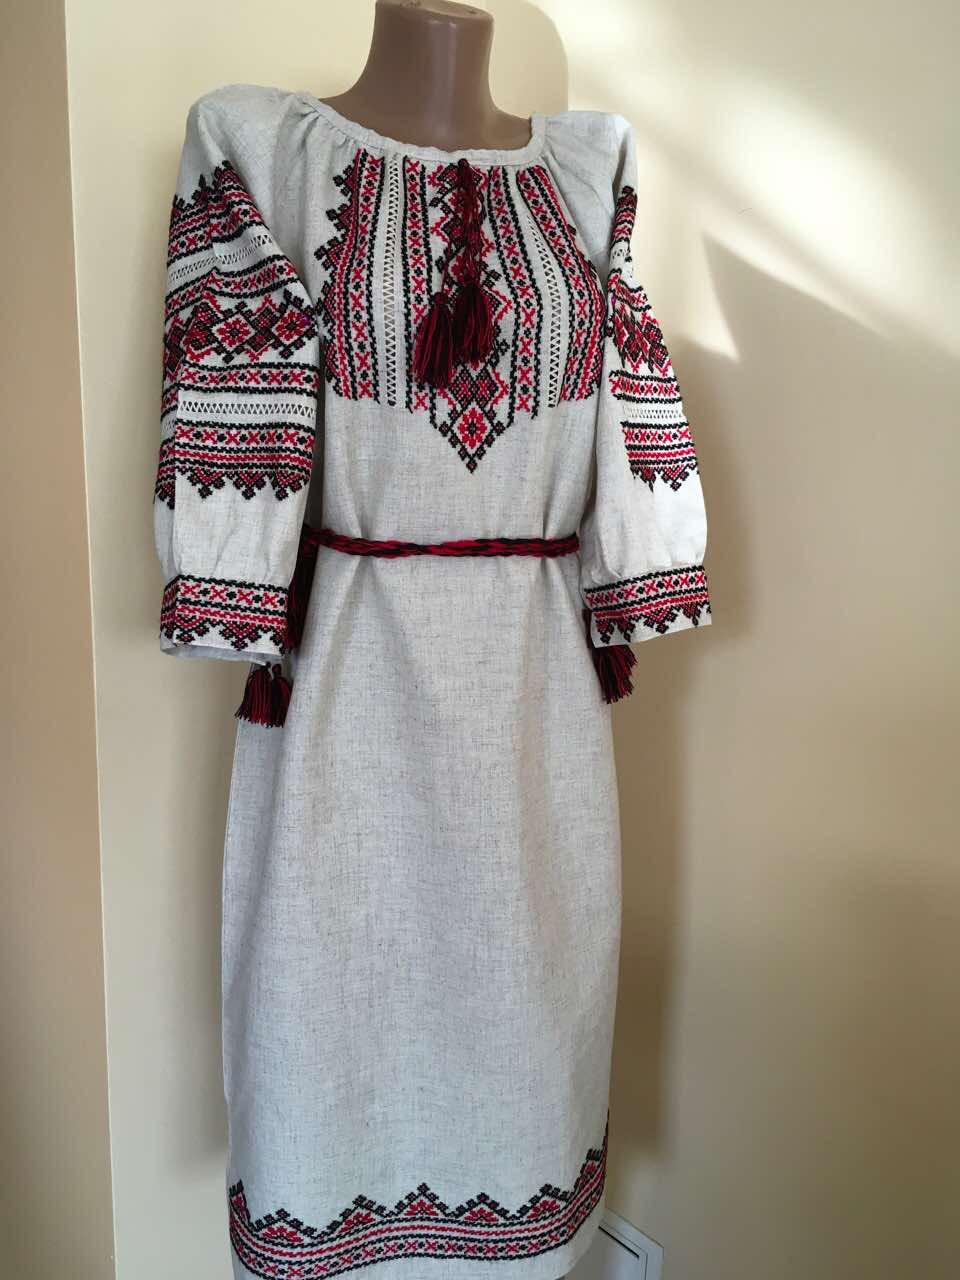 41fac3236e08e3 Сукня вишита ручної роботи на сірому льоні 50-52 розмір - Скарбниця Карпат-  інтернет